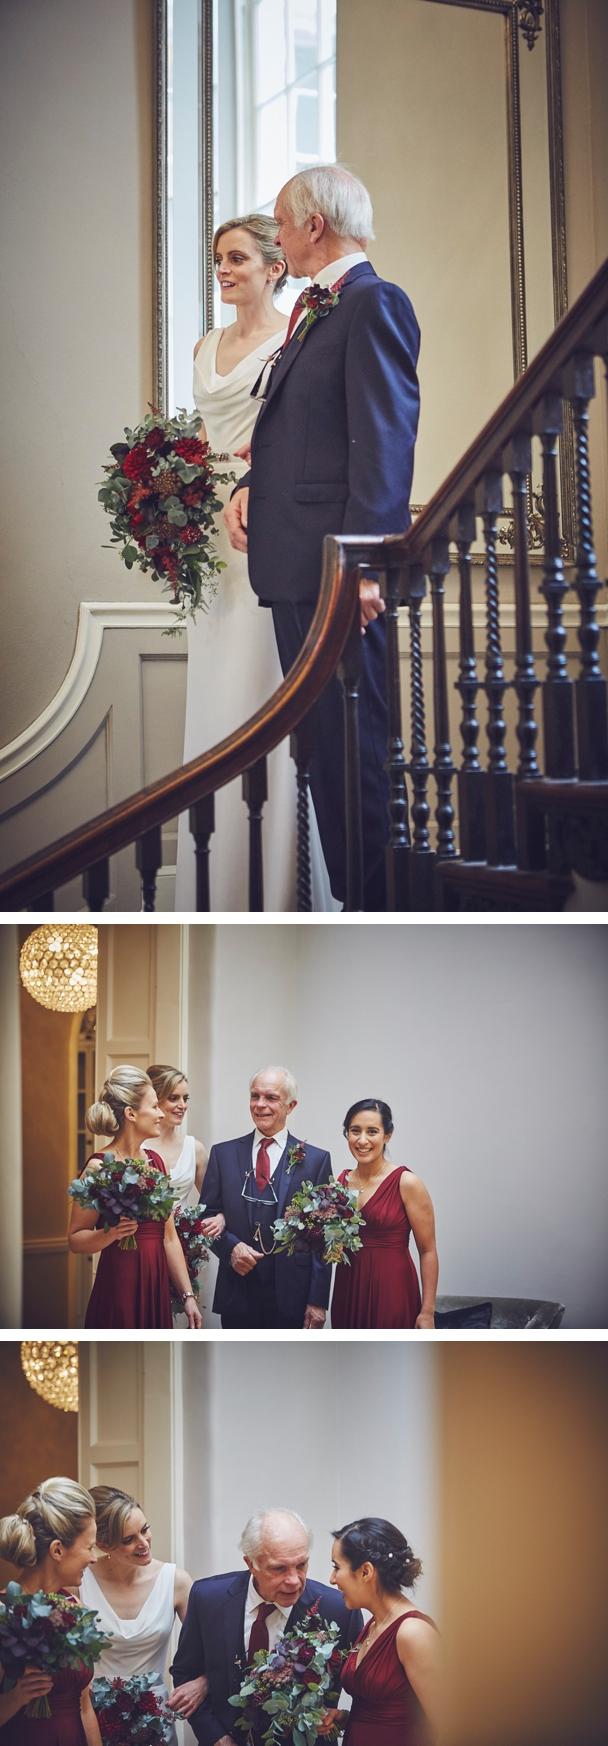 documentary wedding photography of ceremony at Rockbeare Manor Devon